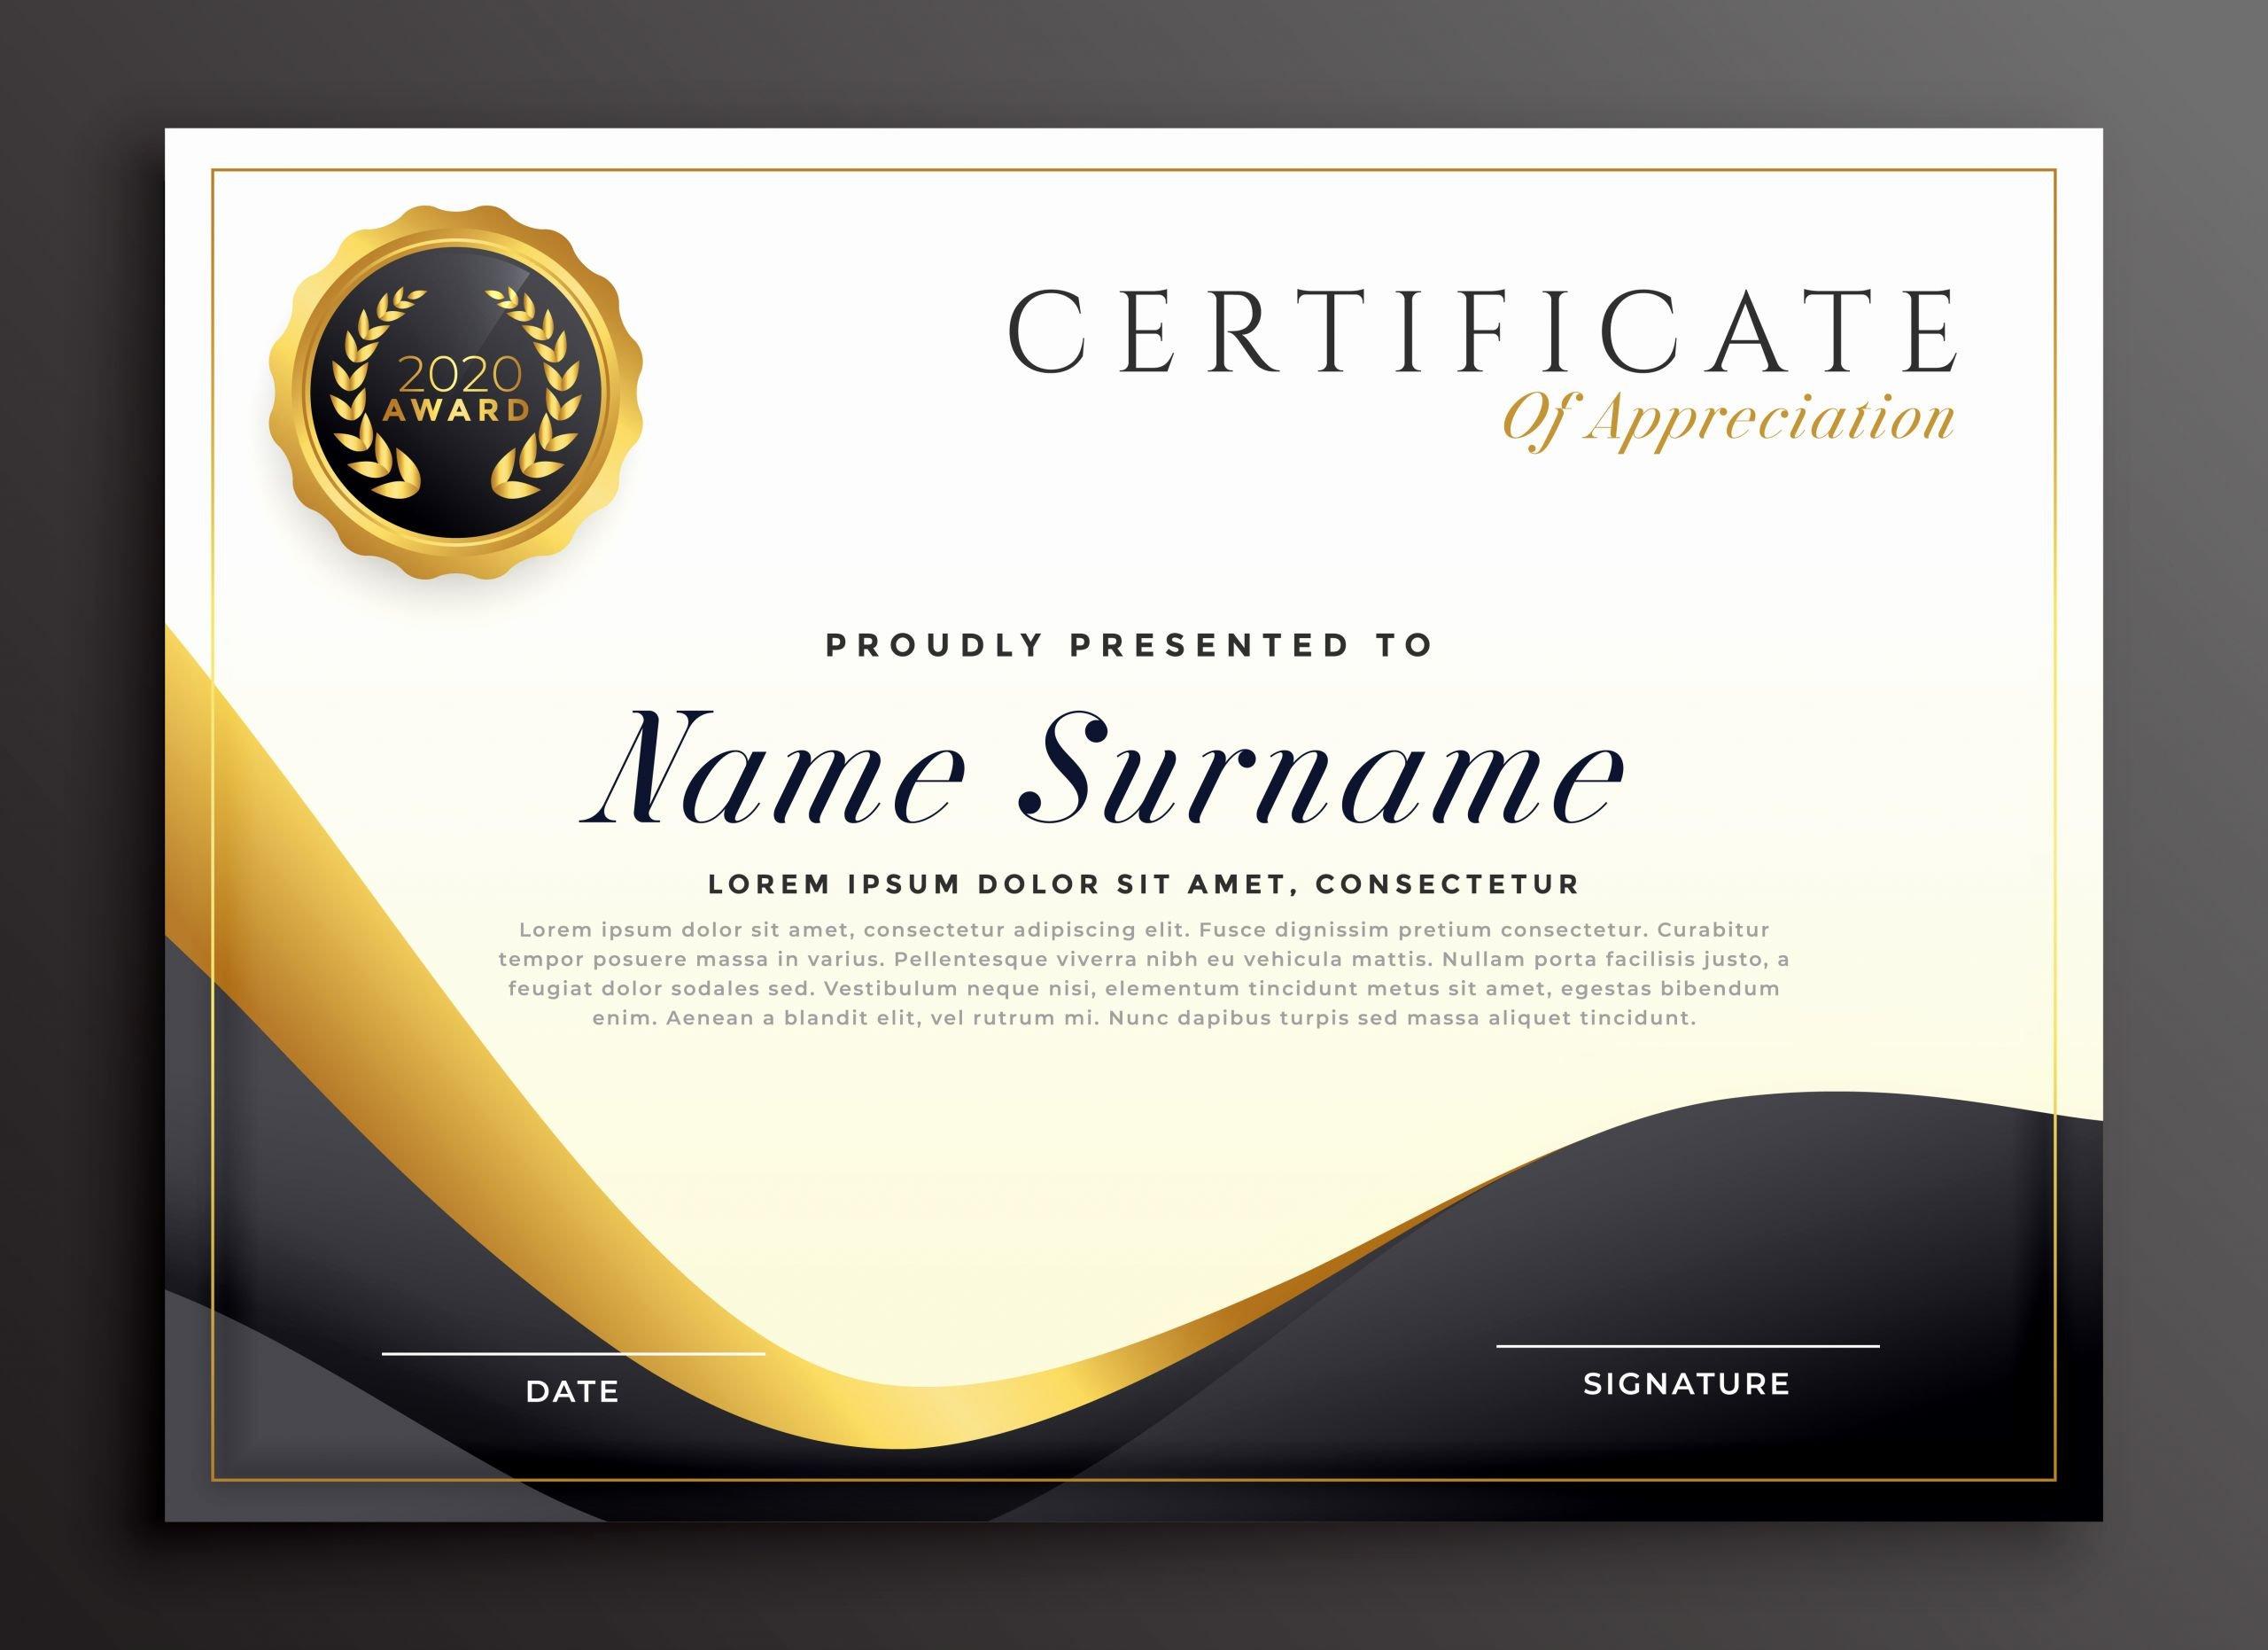 Graduation Certificate Of Appreciation Fresh Luxury Certificate Of Appreciation Template Download